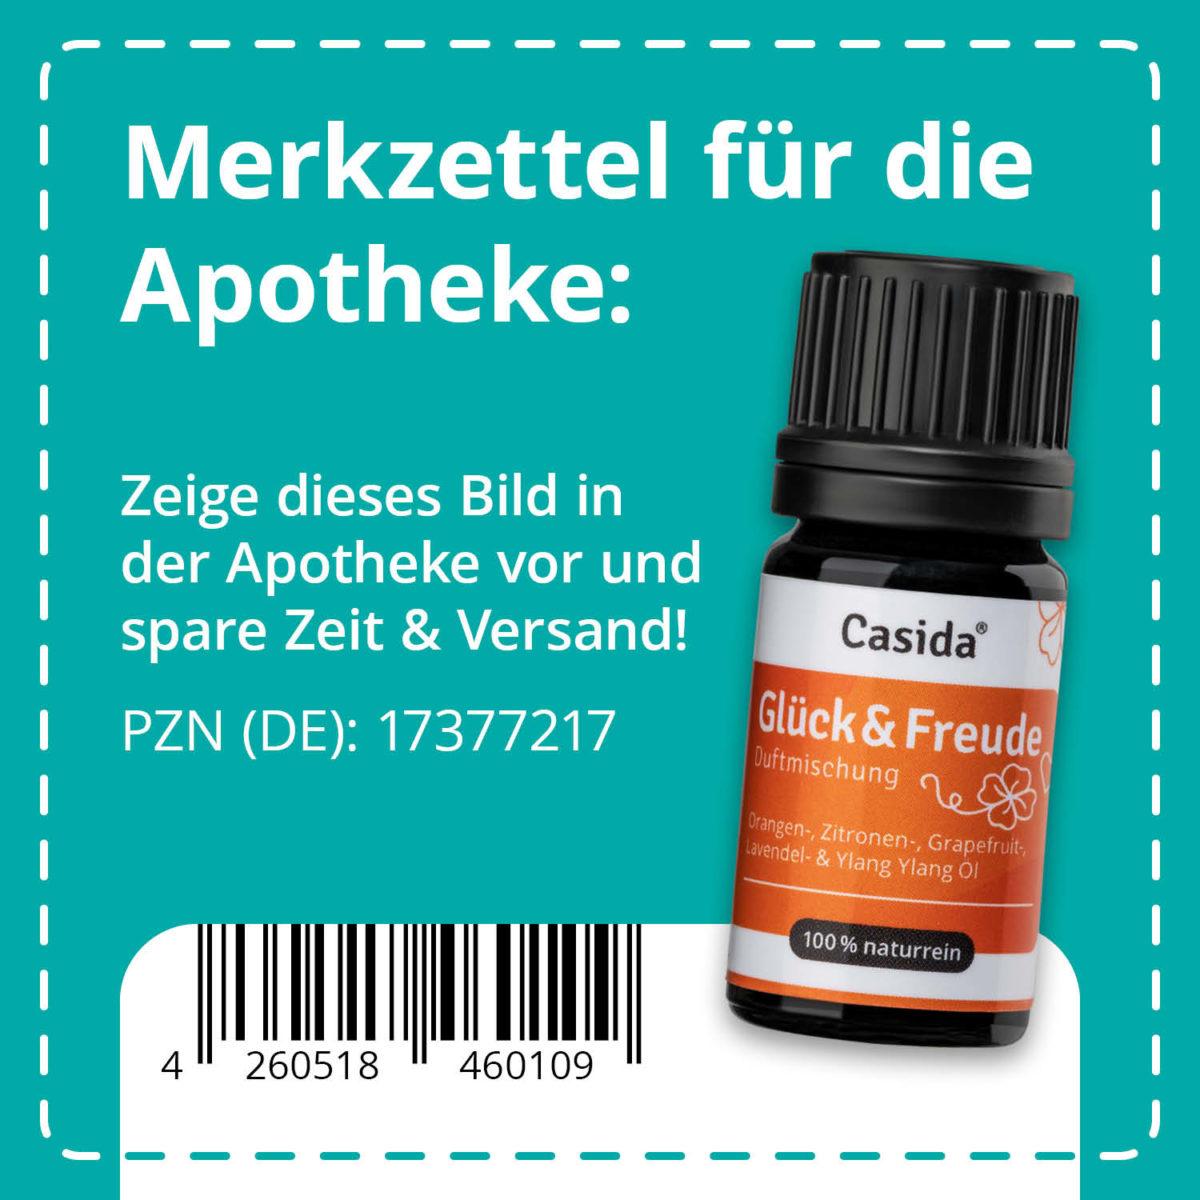 Casida Duftmischung Glück & Freude - 5 ml 17377217 PZN Apotheke aufheiternd gute laune Aromatherapie Aromapflege Aromaschmuck Diffuser9